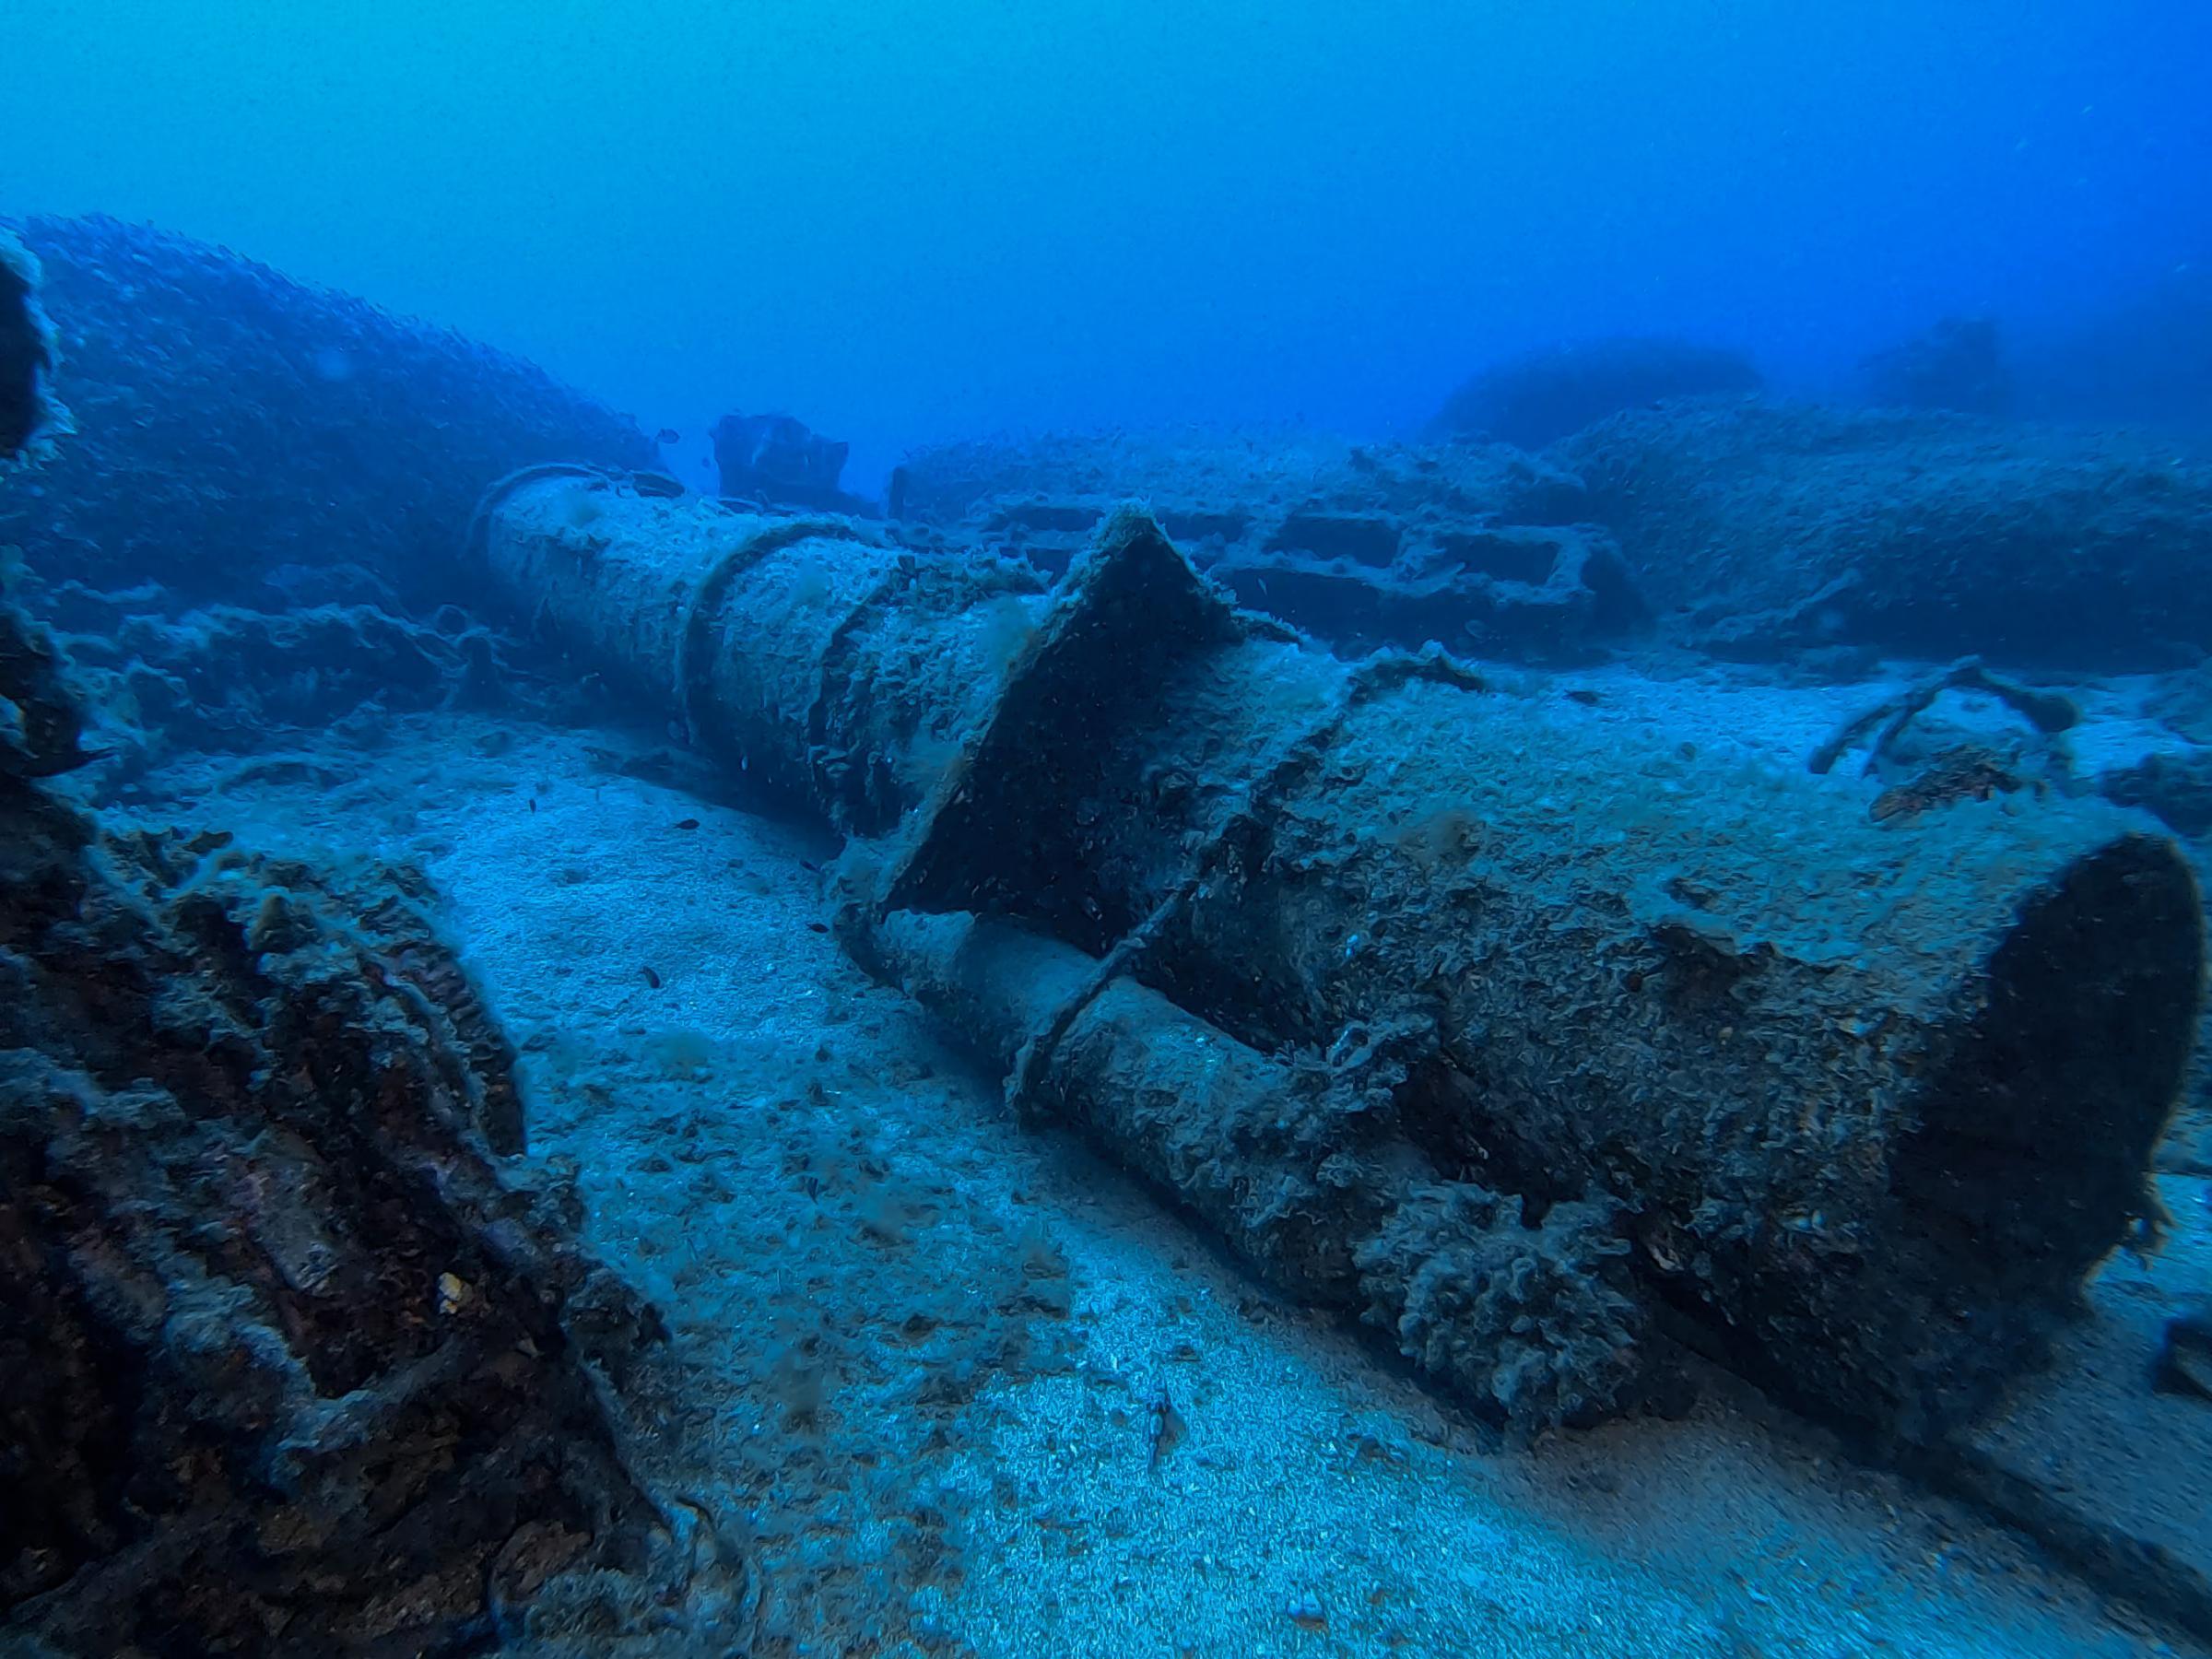 Torpedo Tube [Adam Sant]